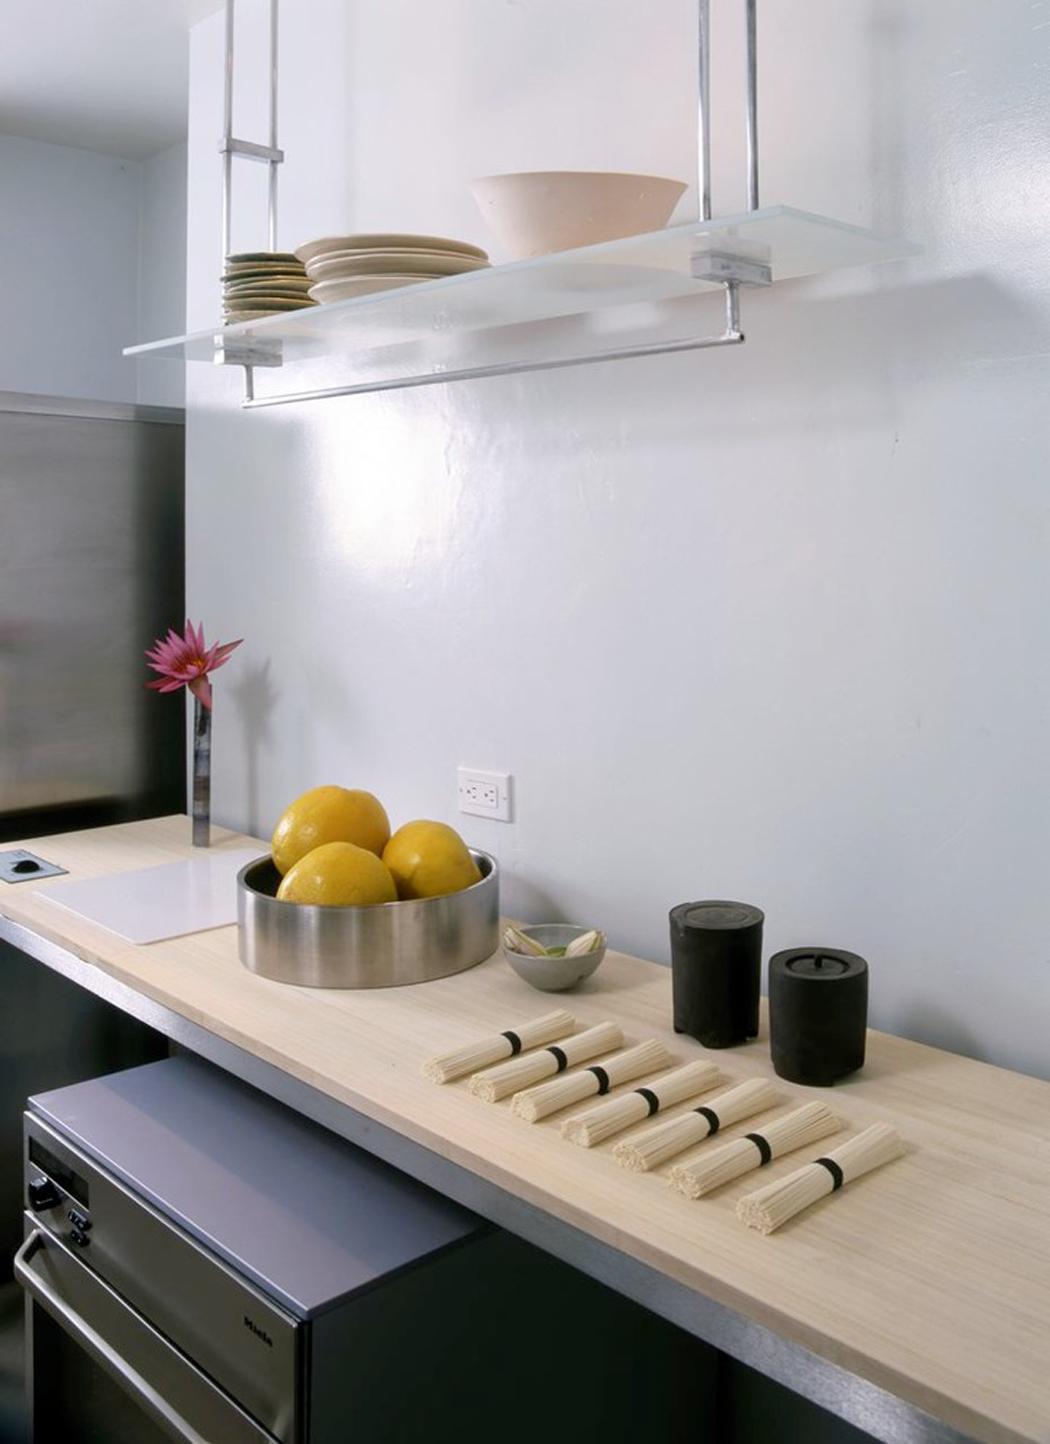 Decoration Cuisine Rideau : Cuisine design minimaliste et zen